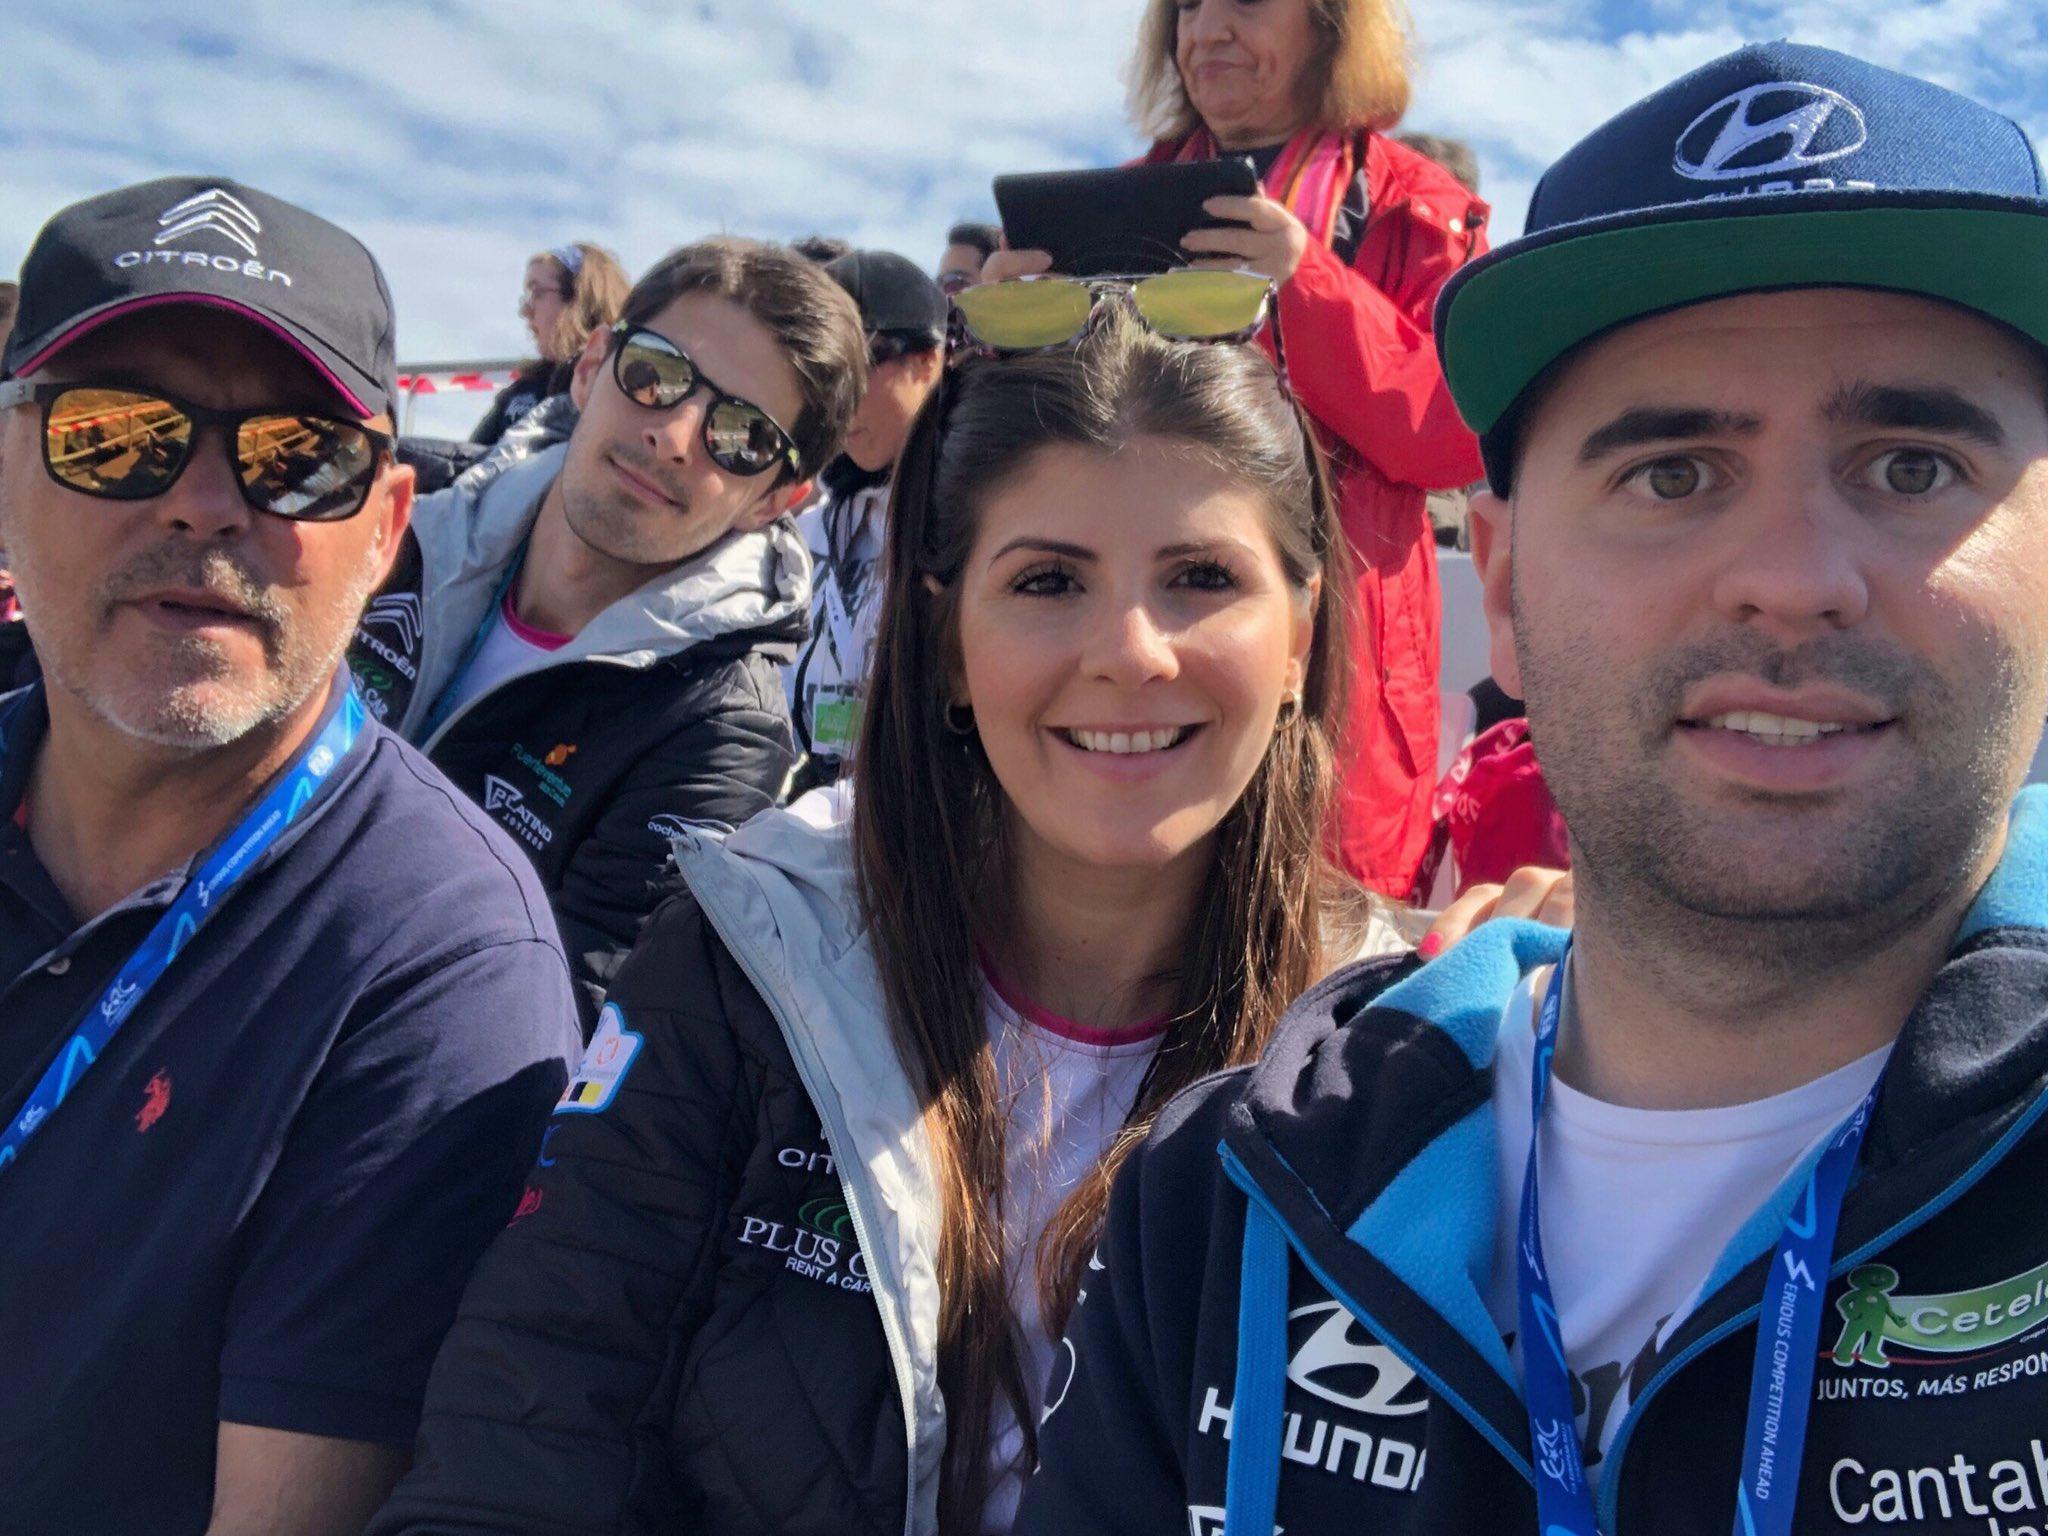 ERC: 53º Azores Airlines Rallye [22-24 Marzo] - Página 3 DZDm_1vX4AEeTCs